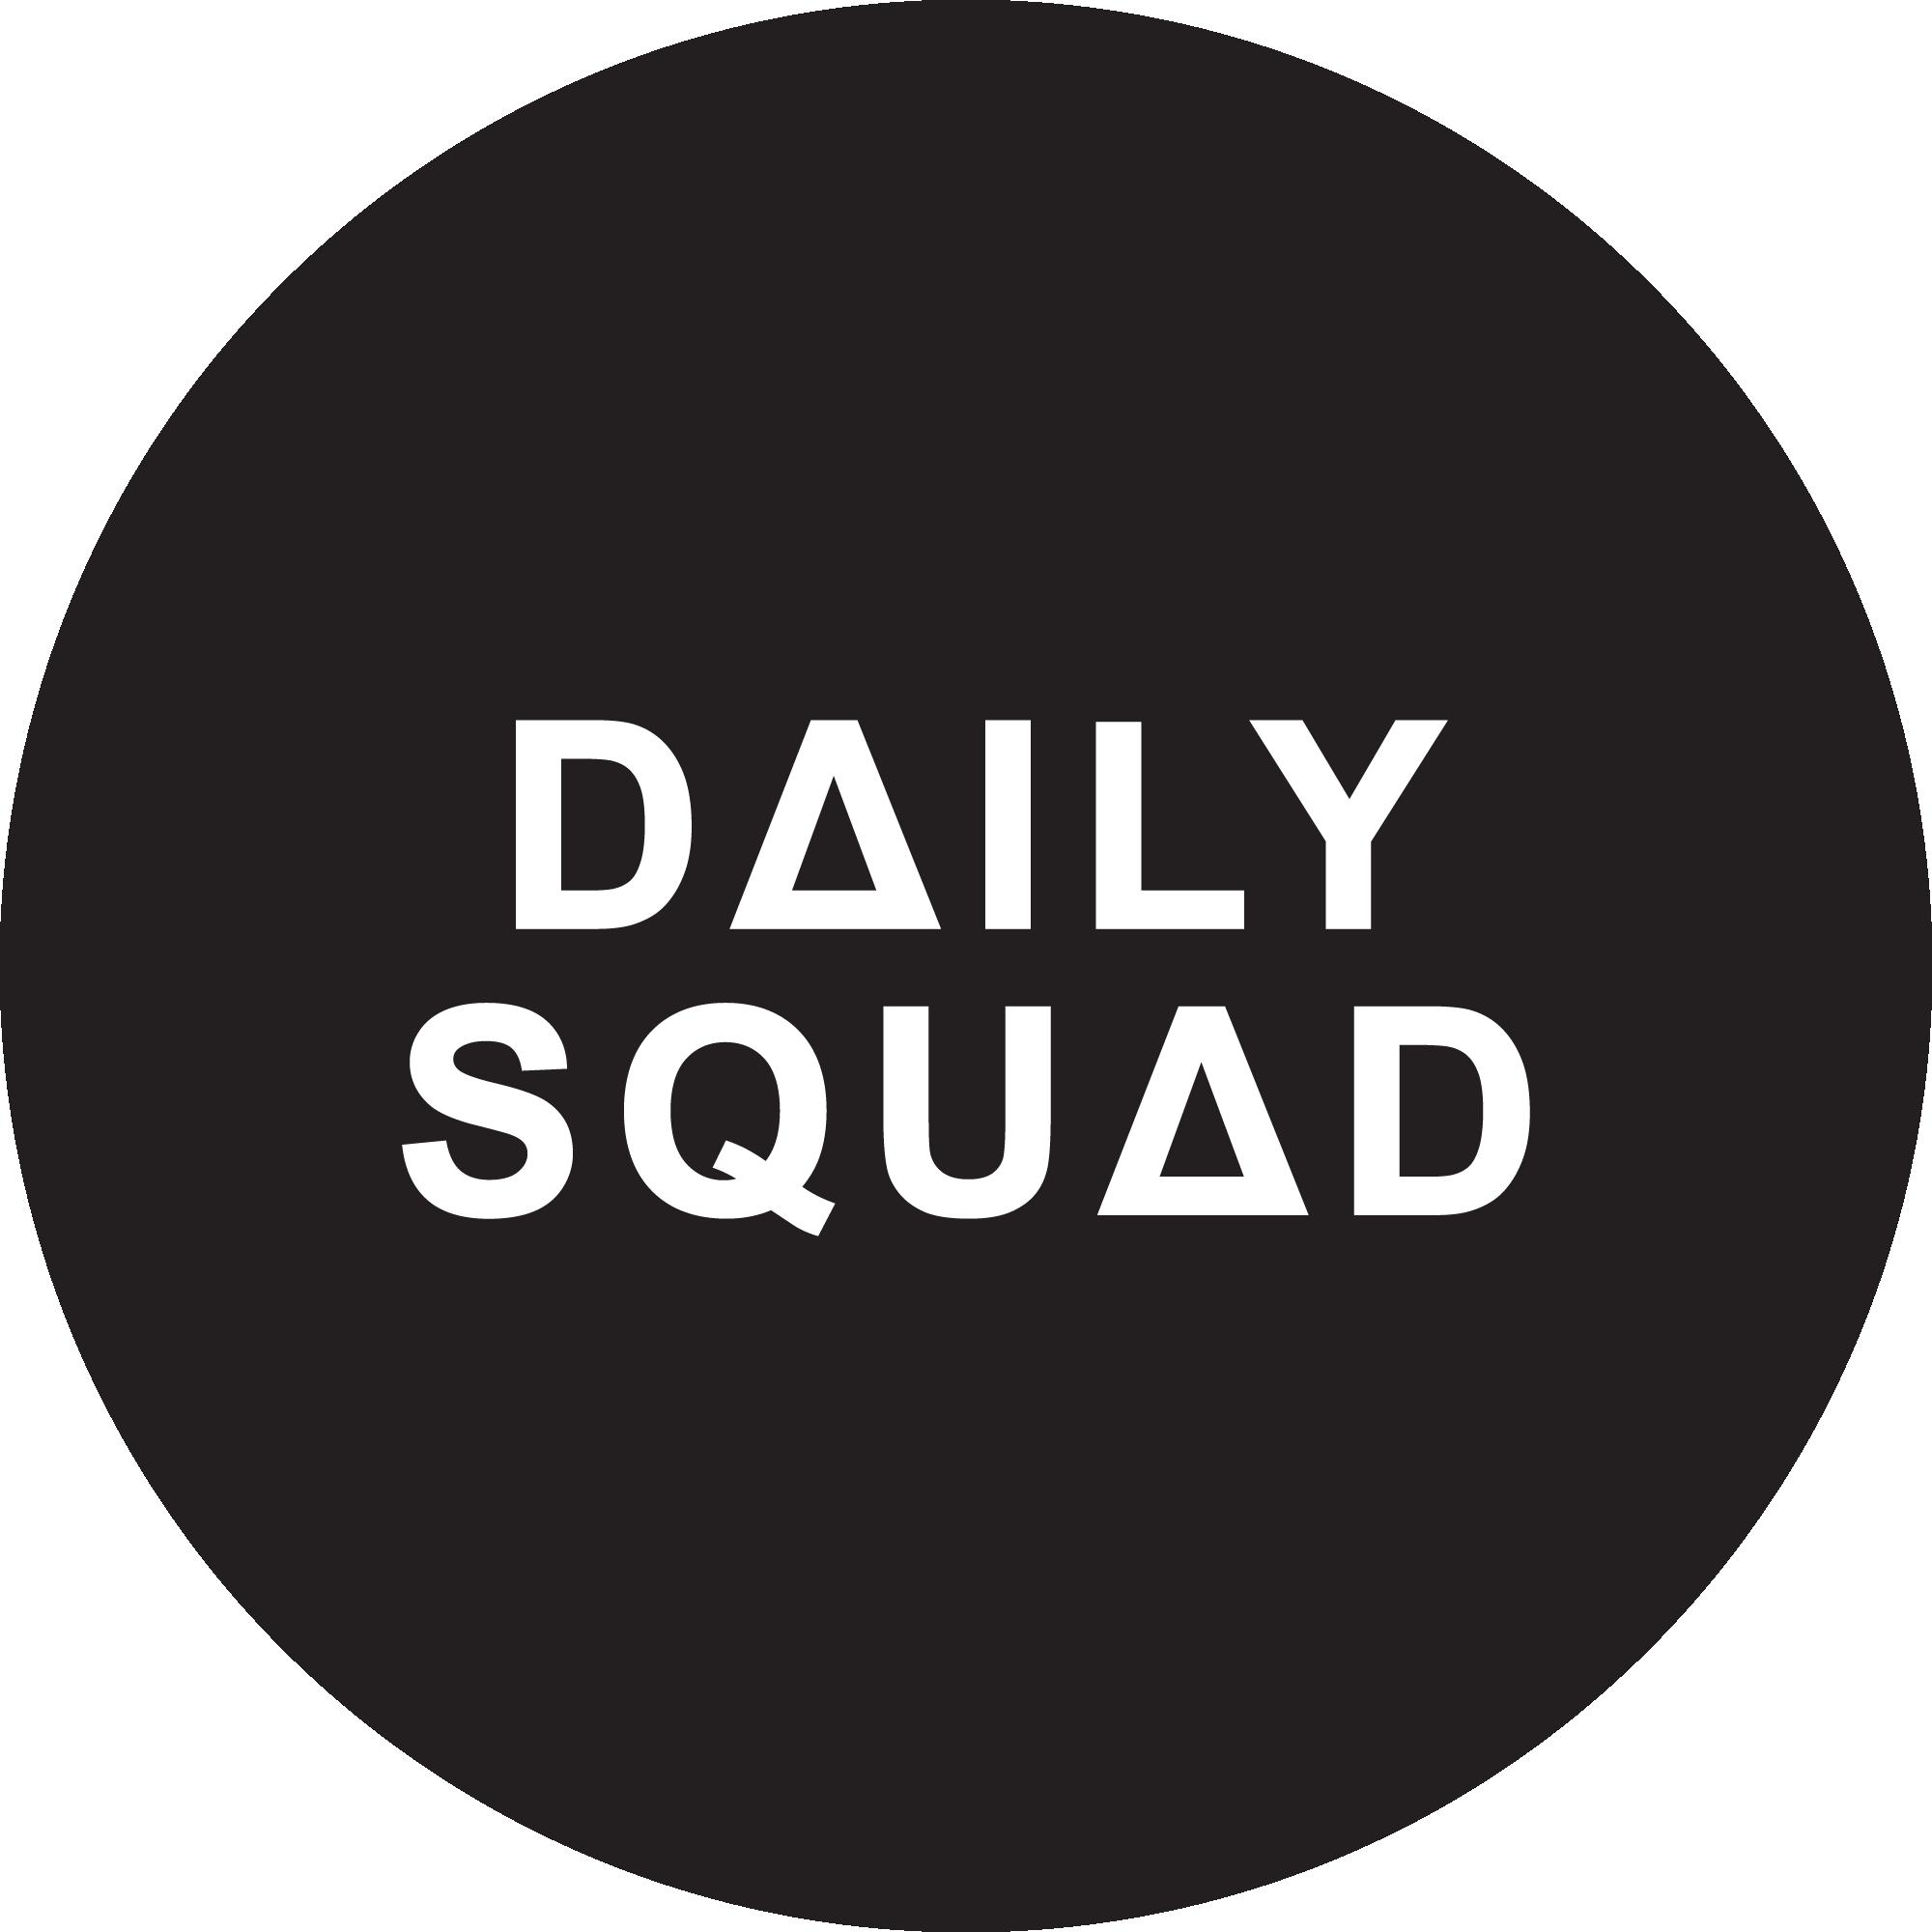 Dailysquad - HAPPY tank top (เฉพาะม่วงผ้าจะบางกว่าสีอื่นค่ะแต่ที่ทำเพราะชอบสีน่ารักจริงๆ :)